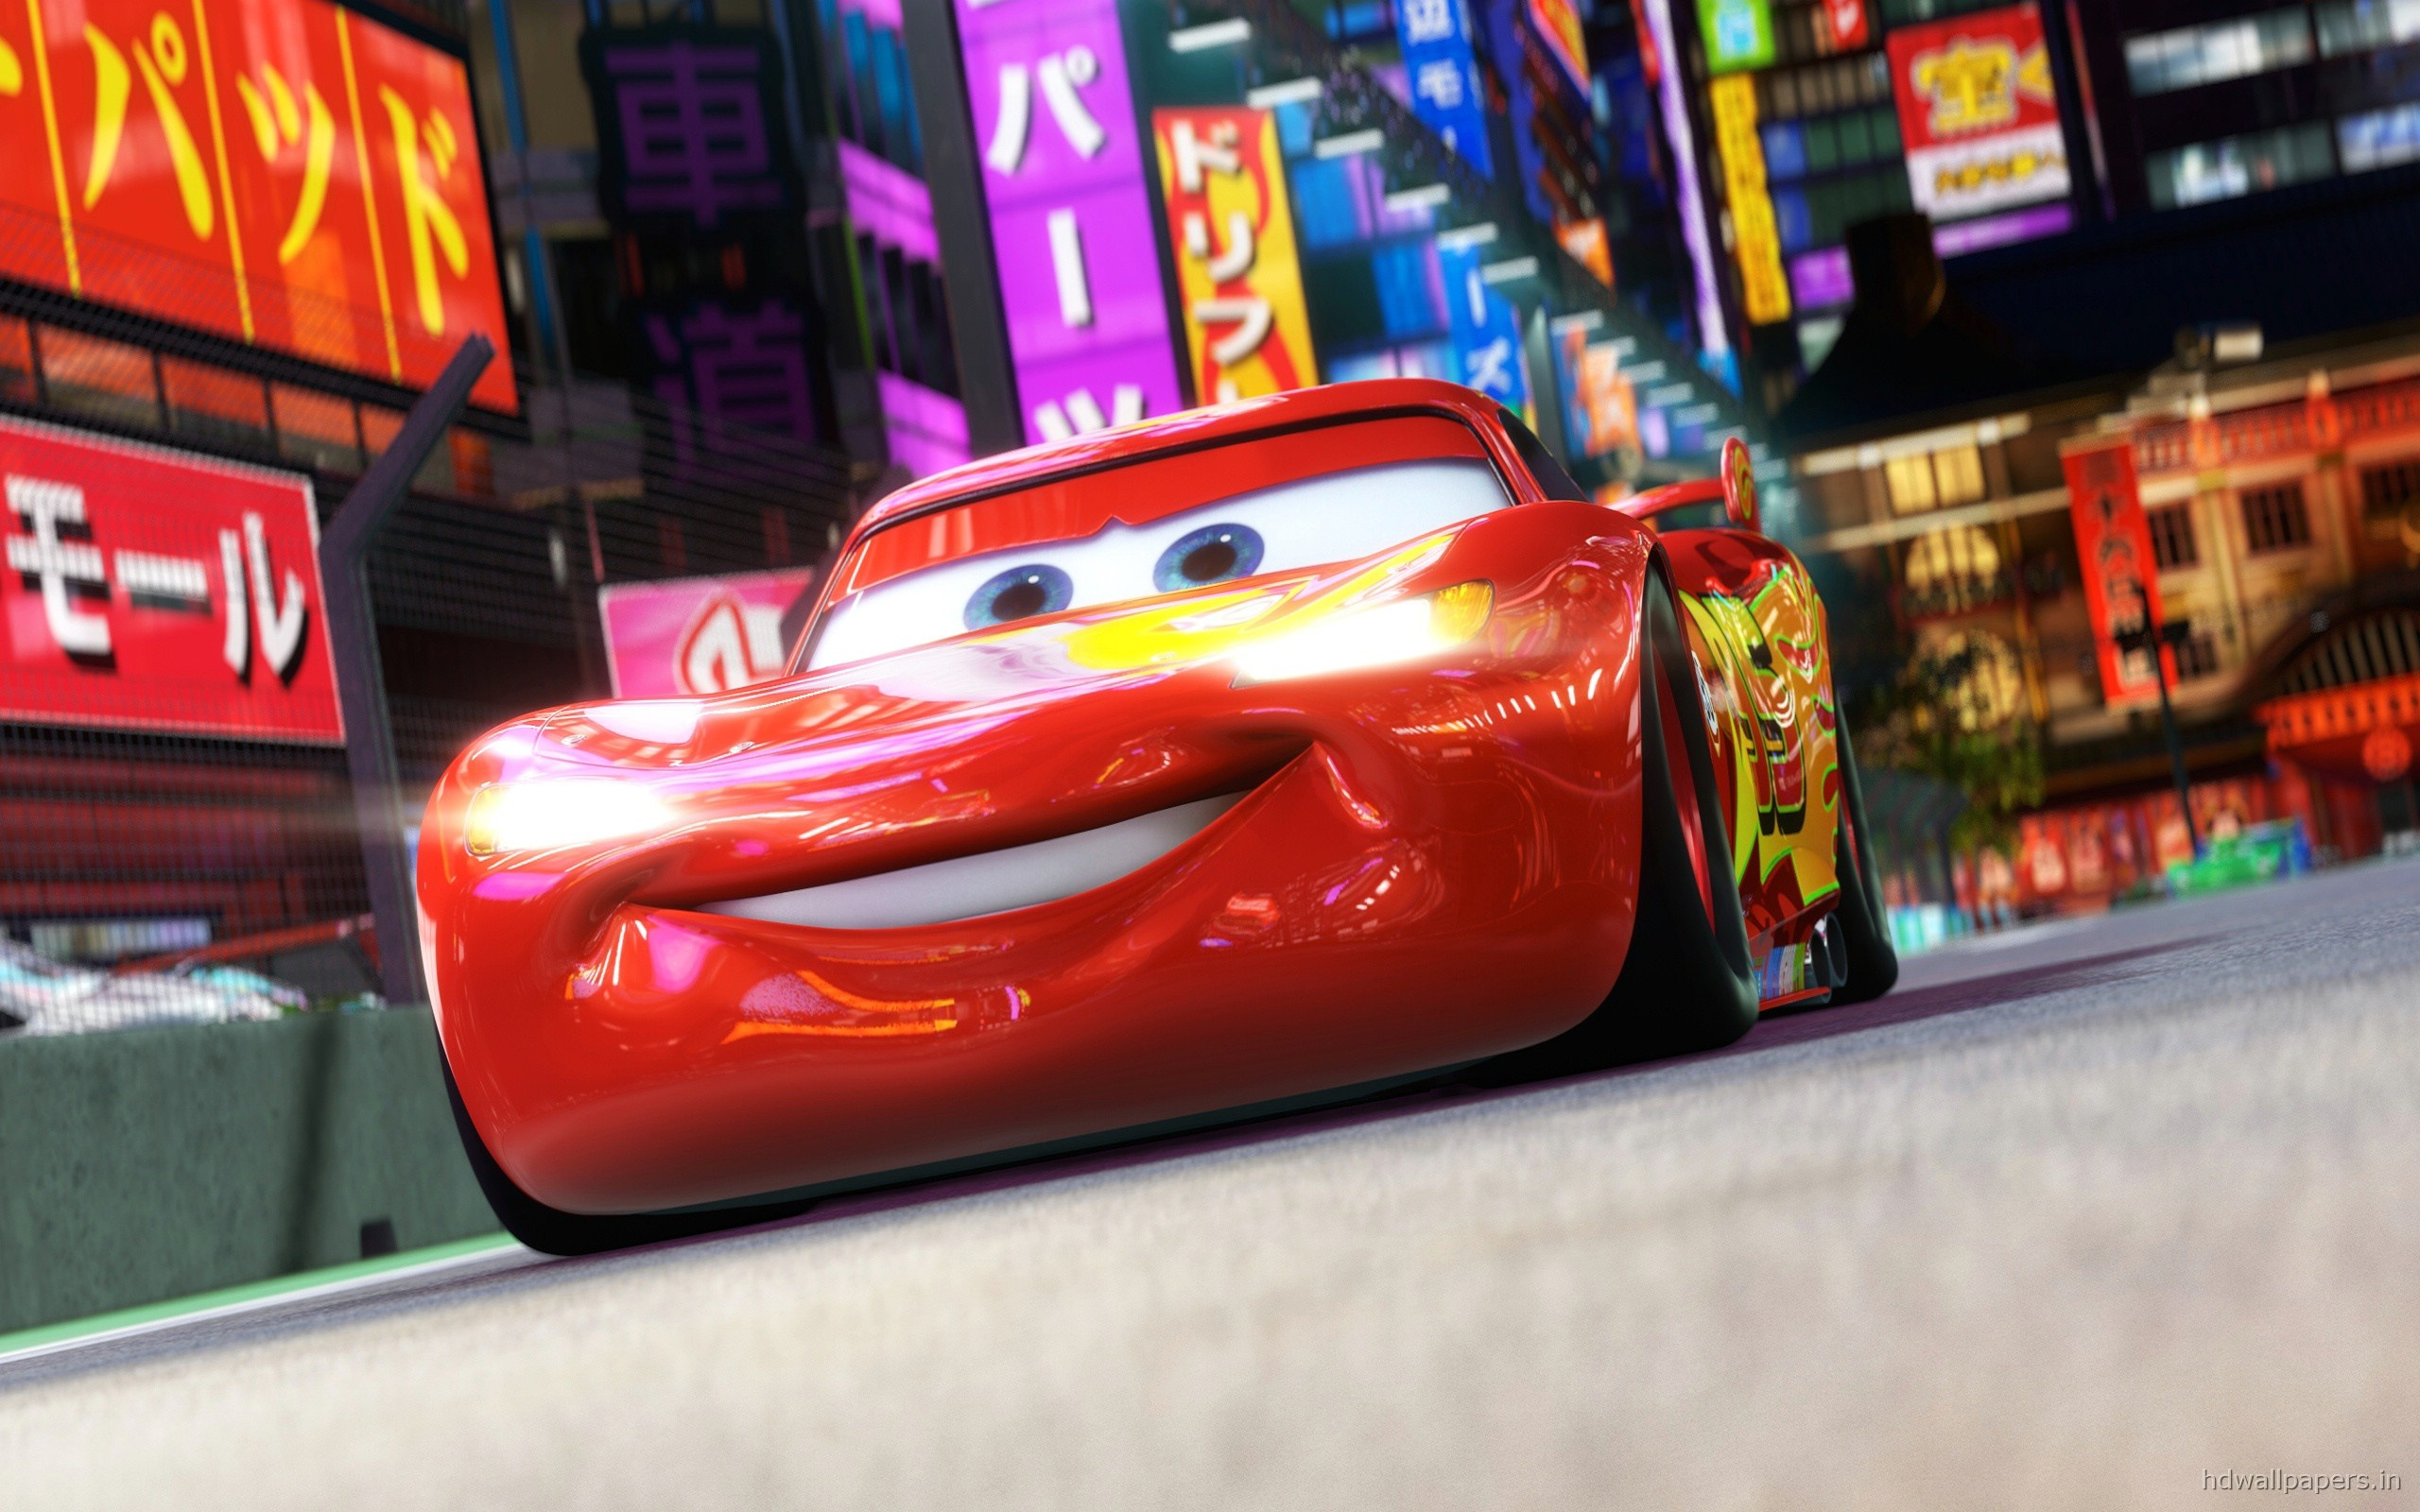 Disney Pixar Cars Wallpapers Free Download Lightning Mcqueen In Cars 2 Wallpapers In Jpg Format For